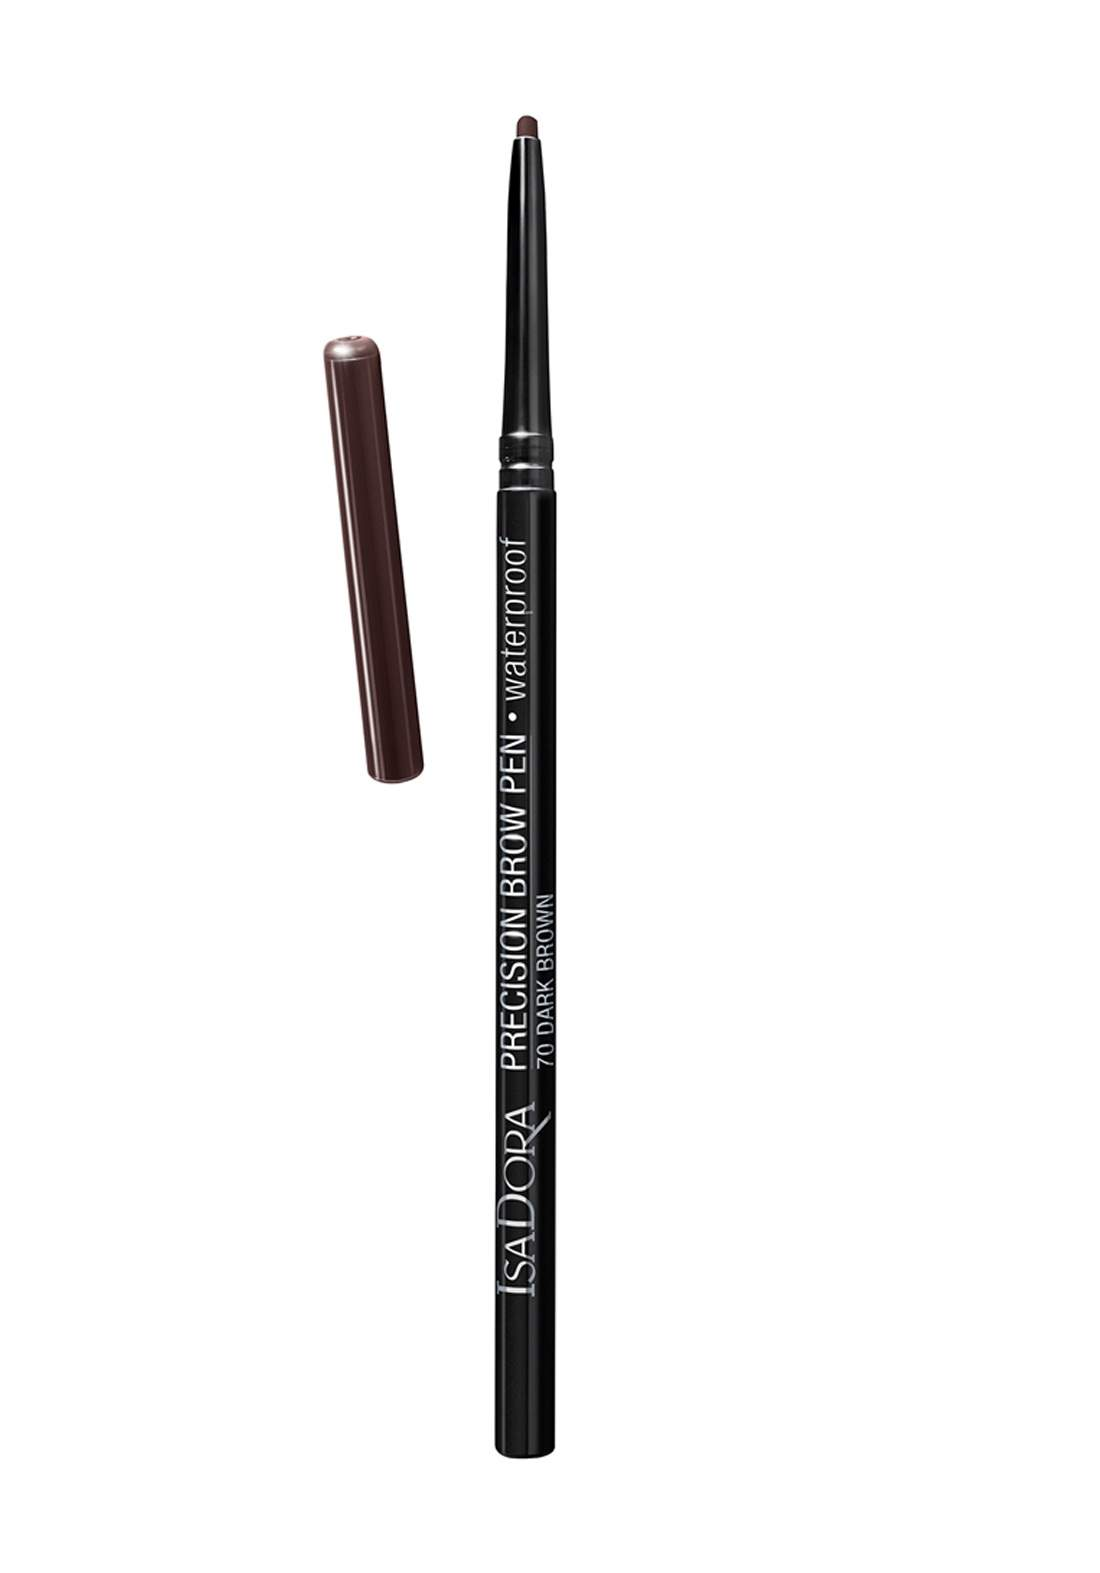 314201 Isadora Precision Brow Pen Wateproof - Dark Brown قلم حاجب